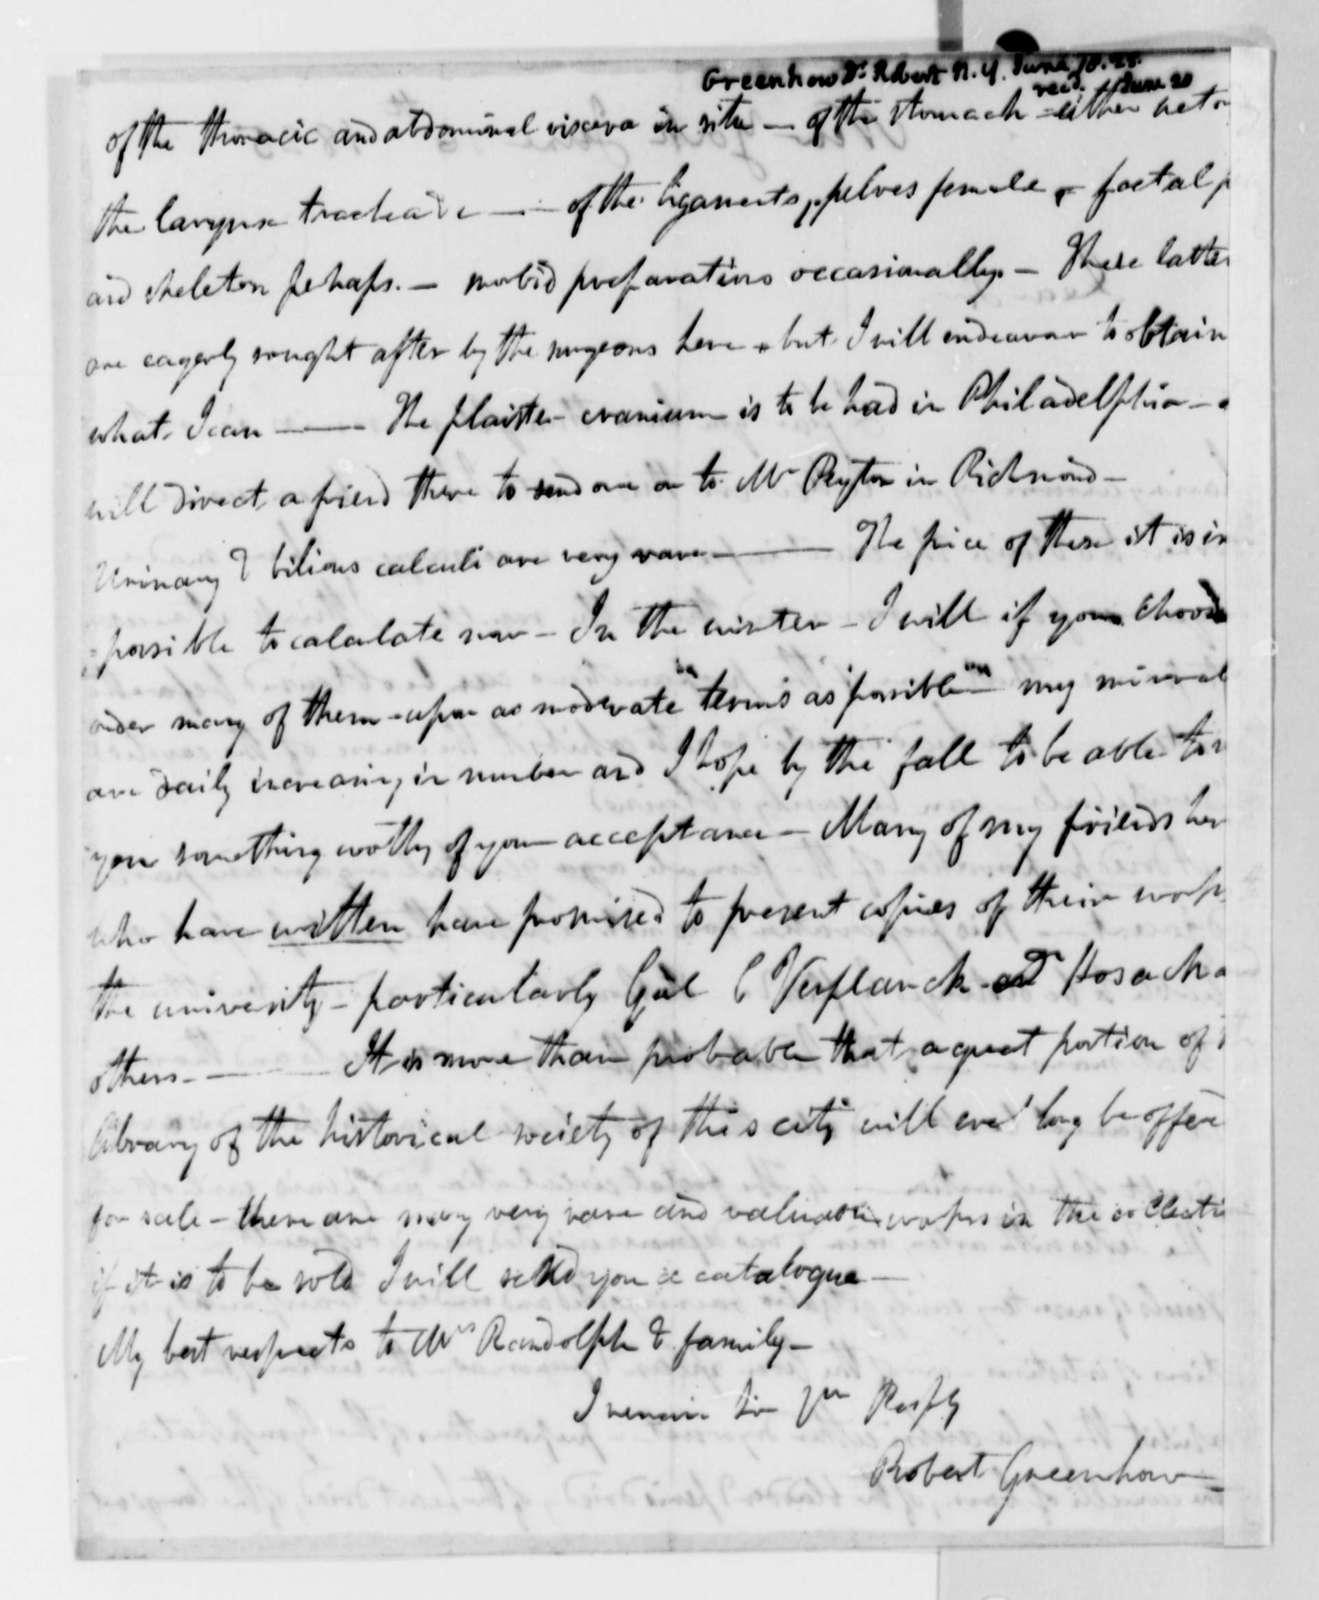 Robert Greenhow to Thomas Jefferson, June 16, 1825